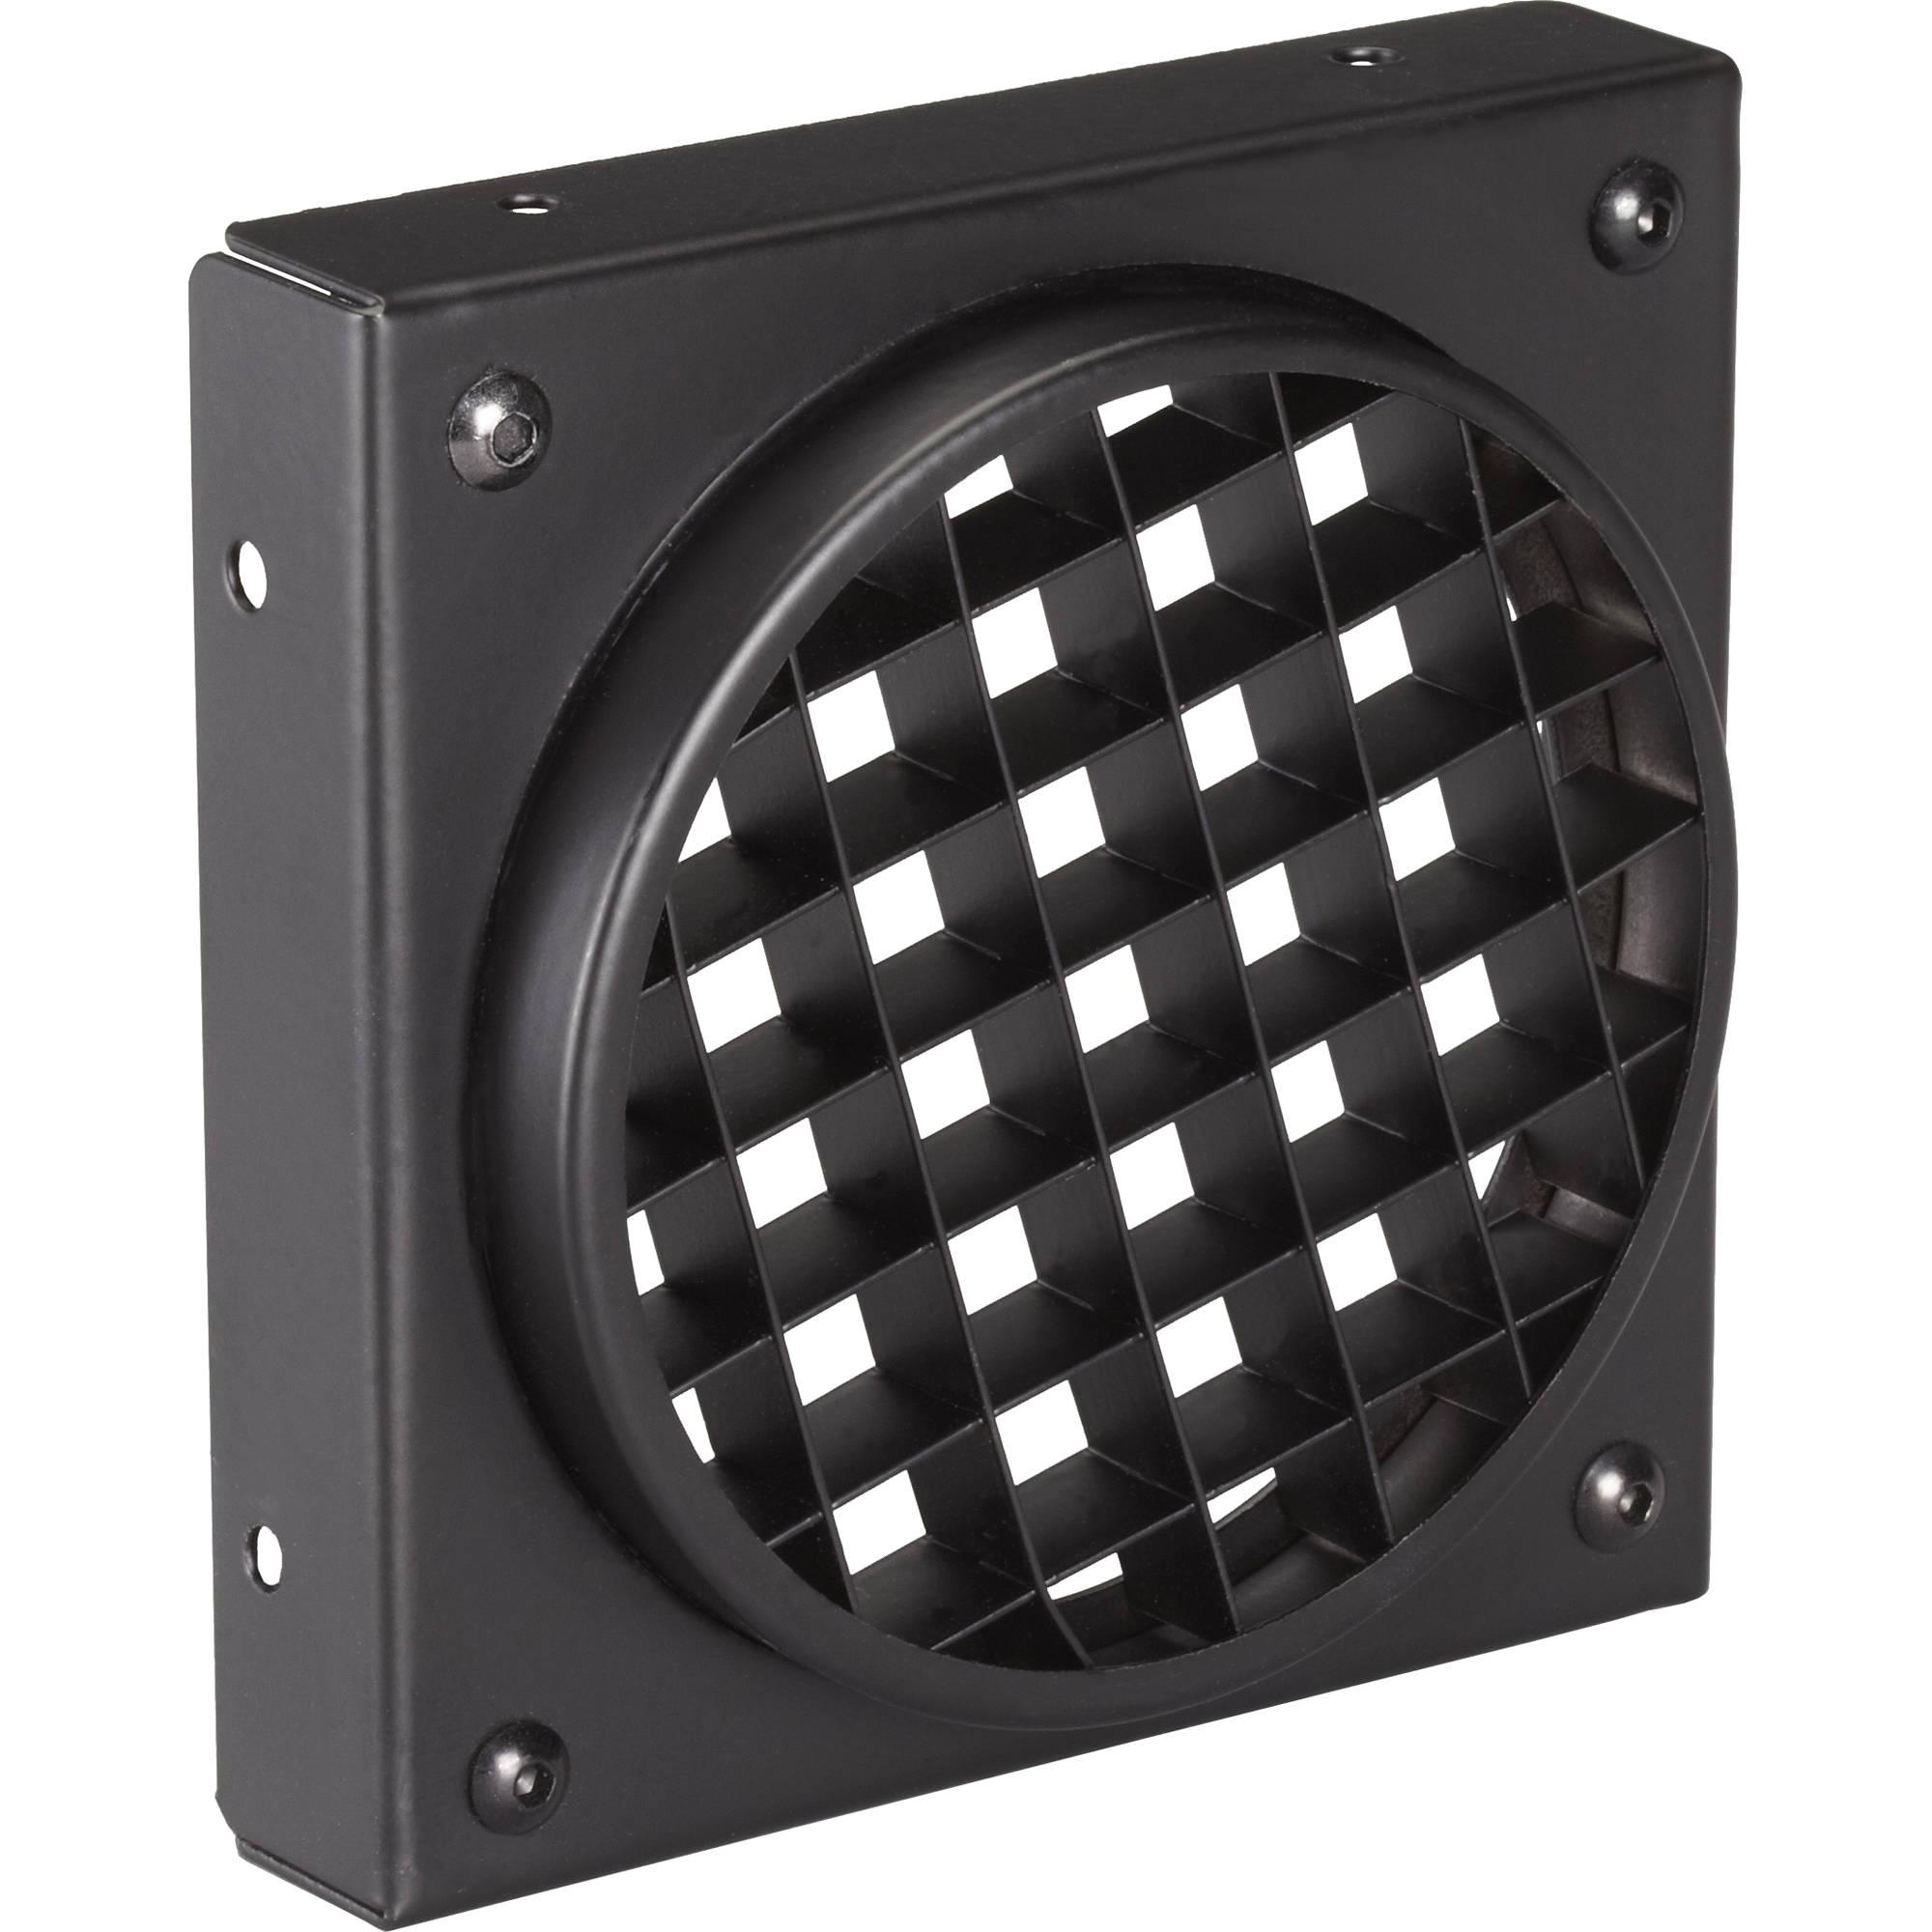 rosco egg crate louver for miro cube led light 515910310003 b h